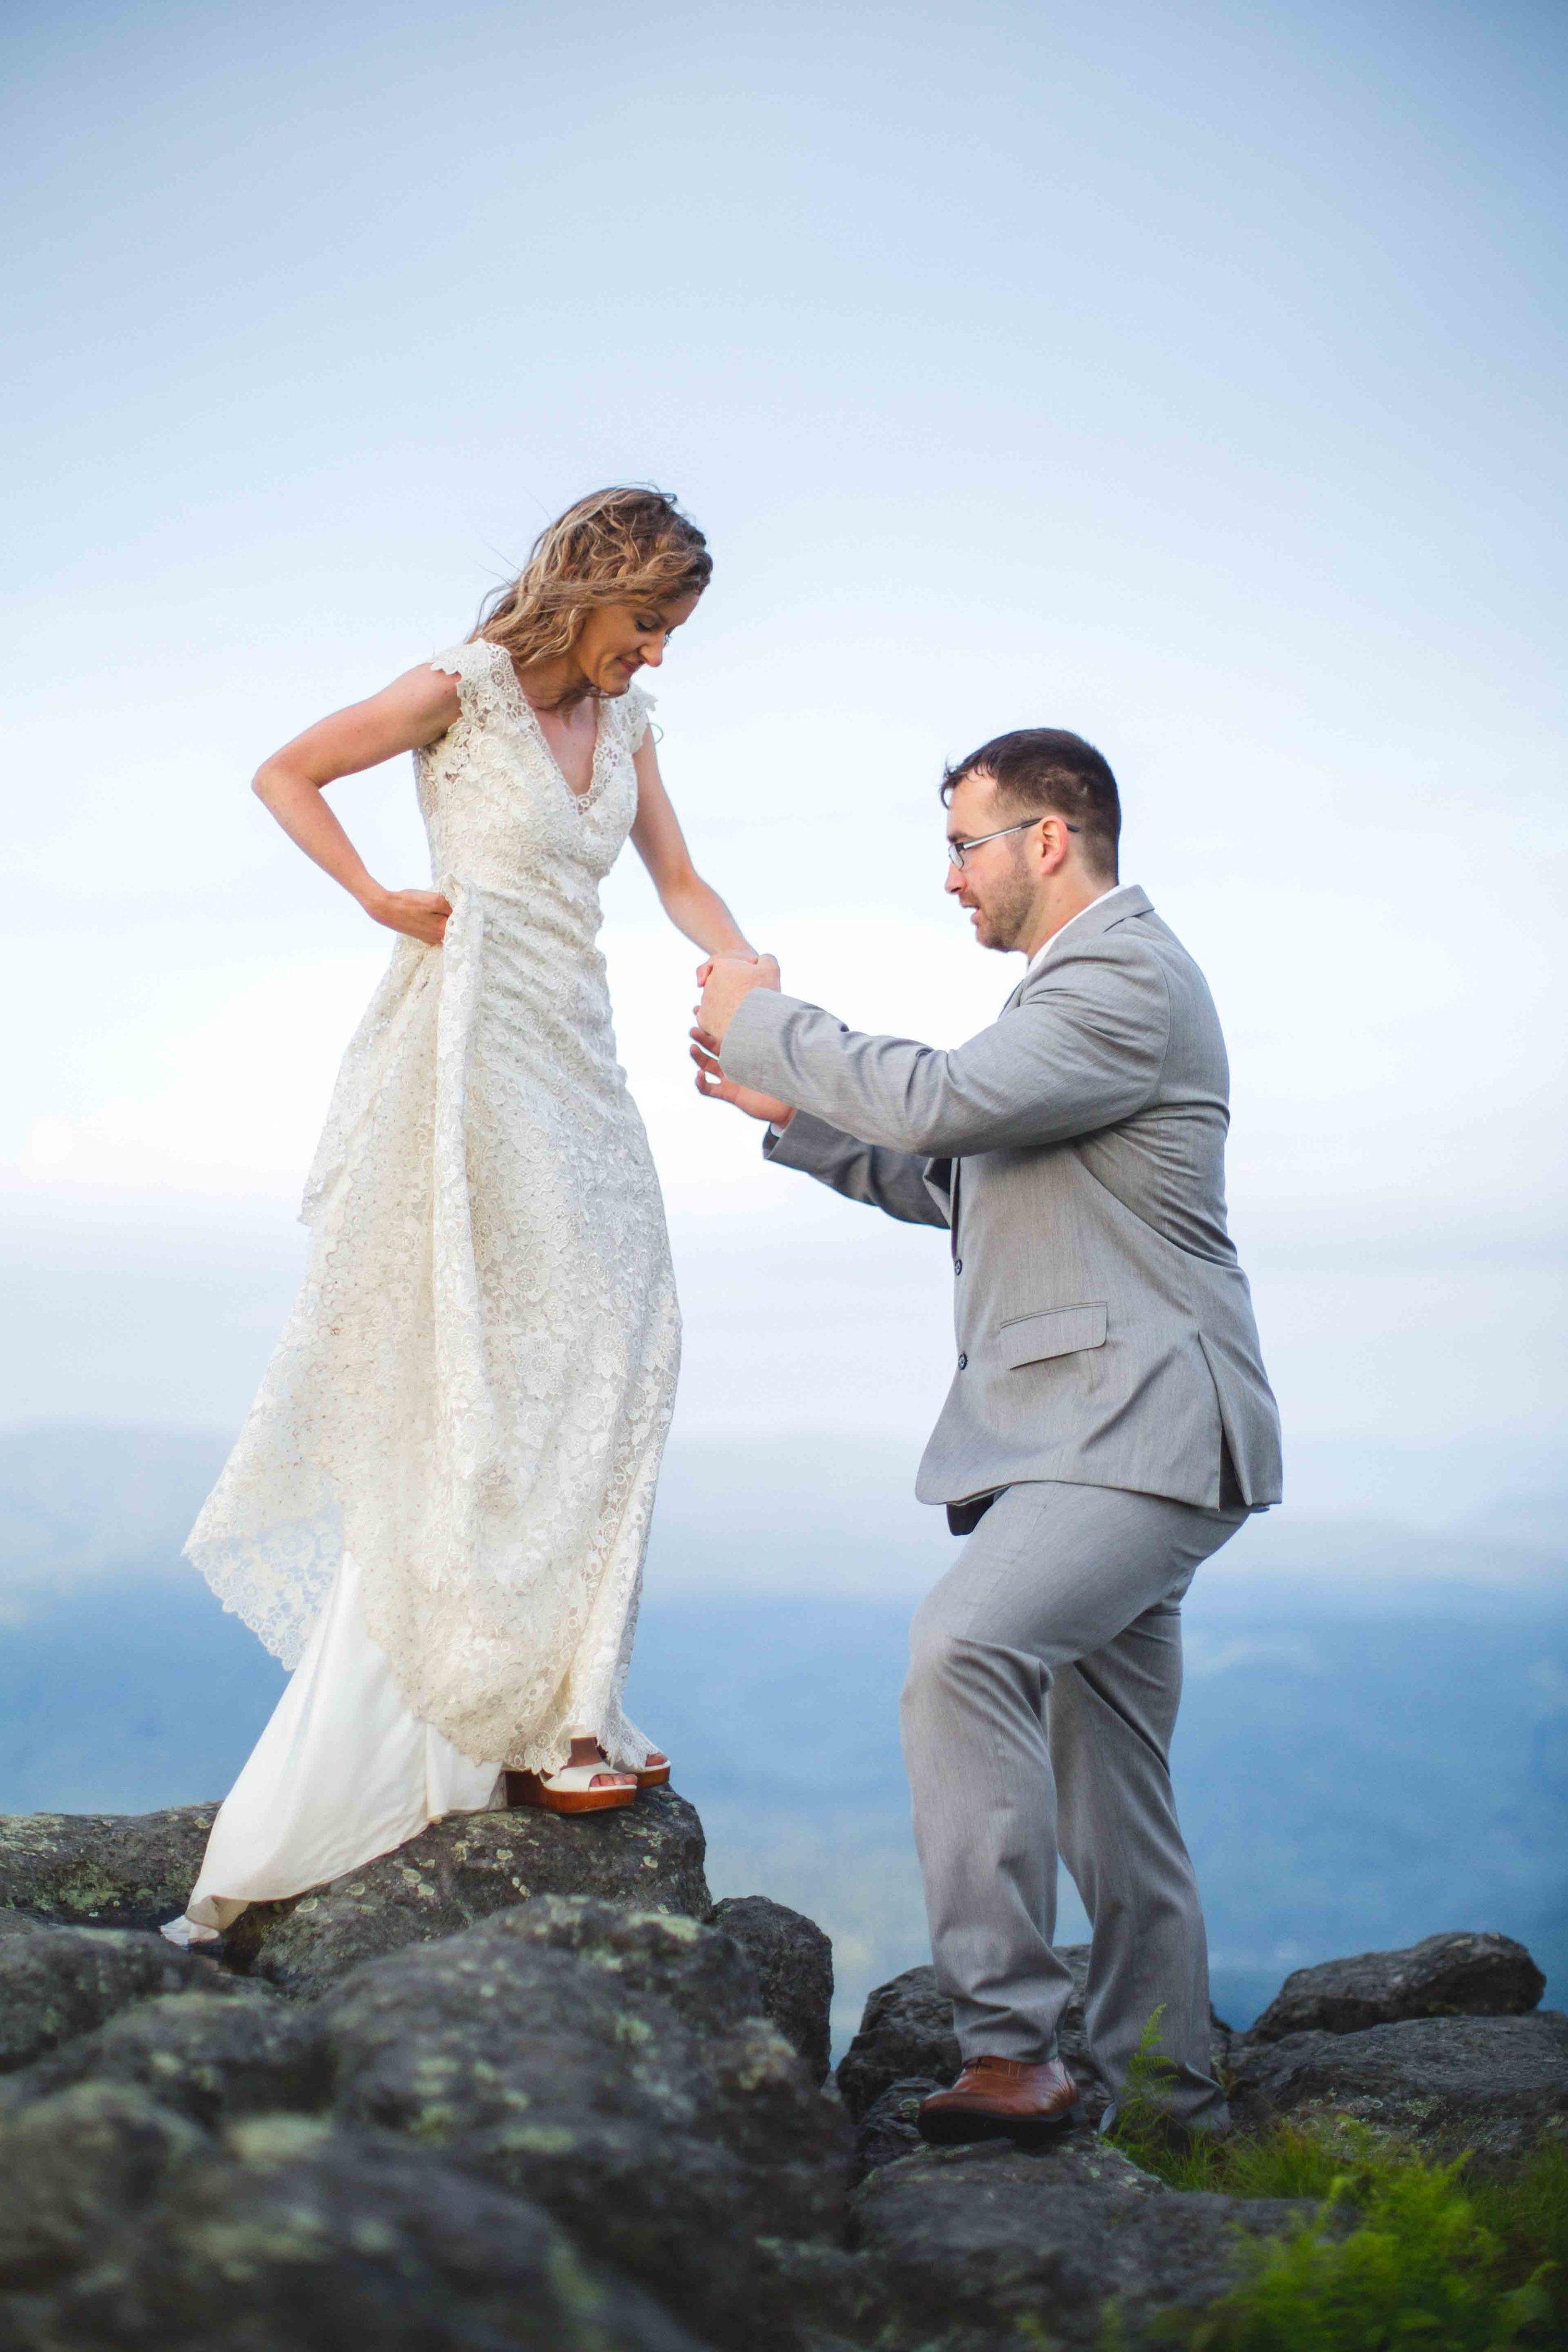 north-carolina-elopement-photographer-84.jpg